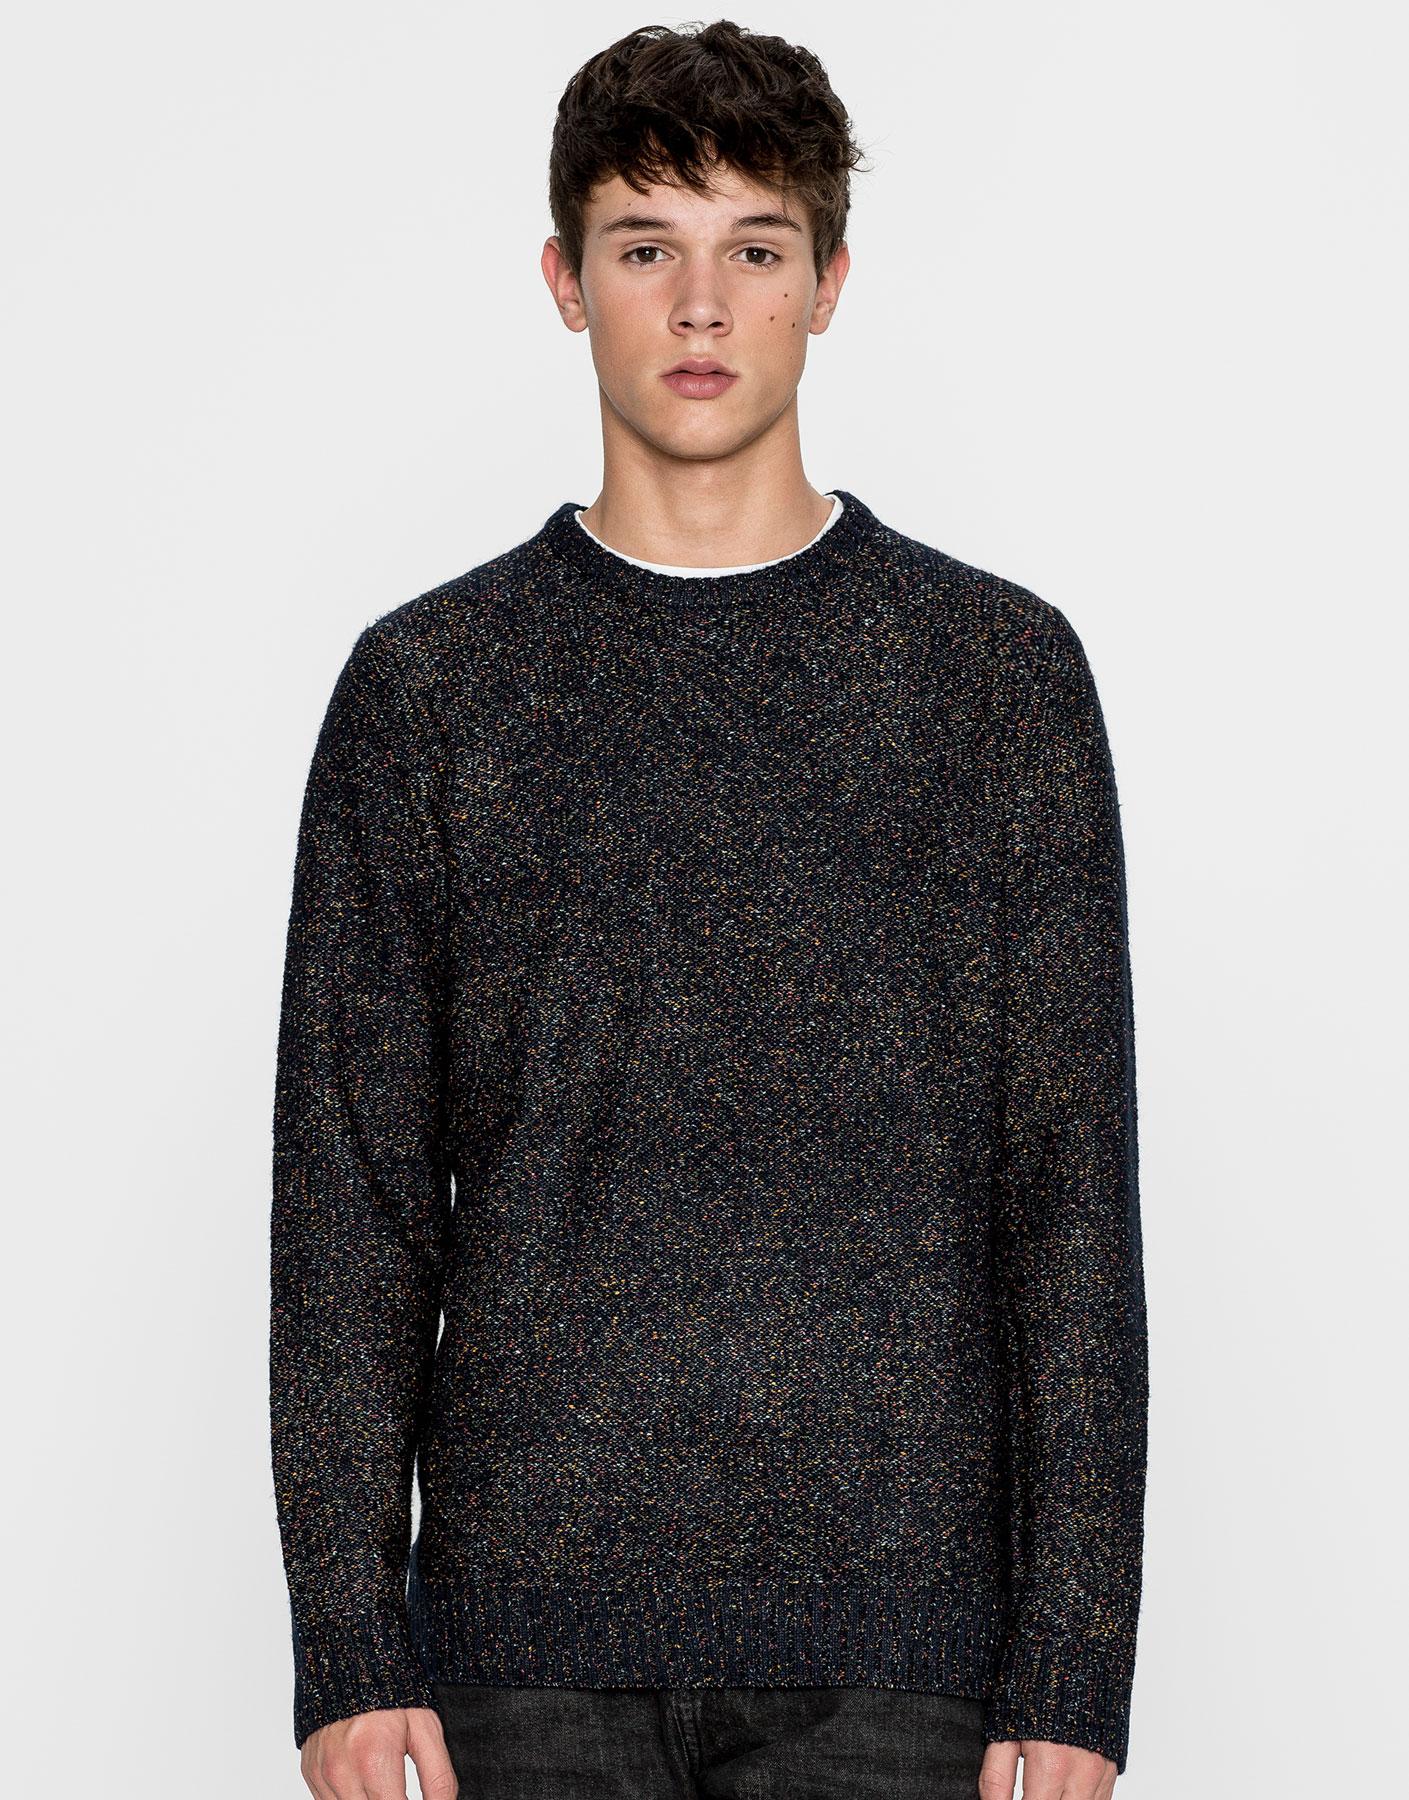 Multicoloured yarn sweater